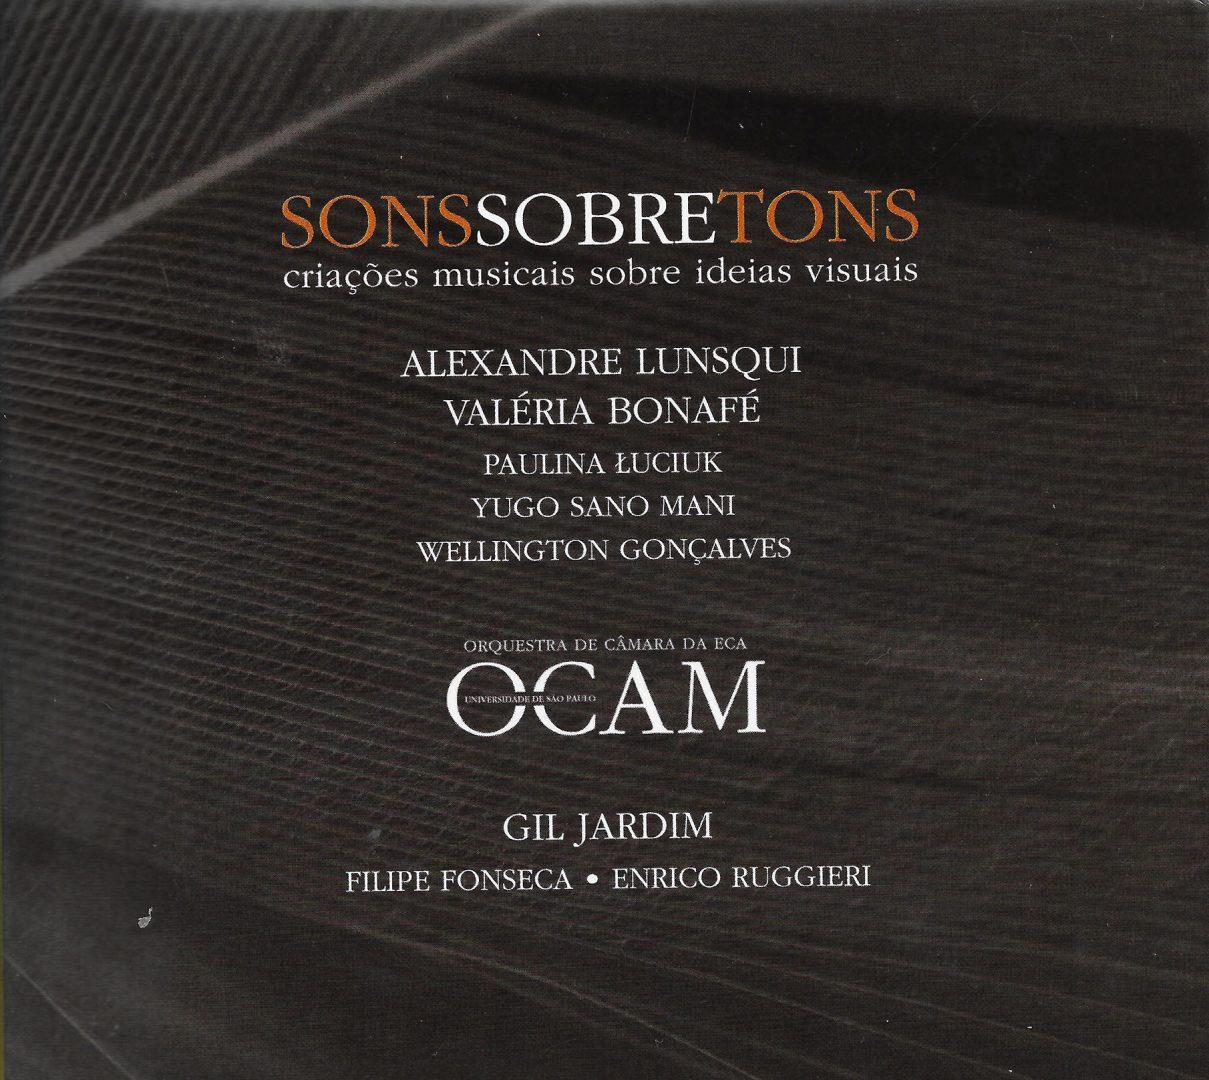 Capa CD Orquestra OCAM 002 Sonorizando imagens